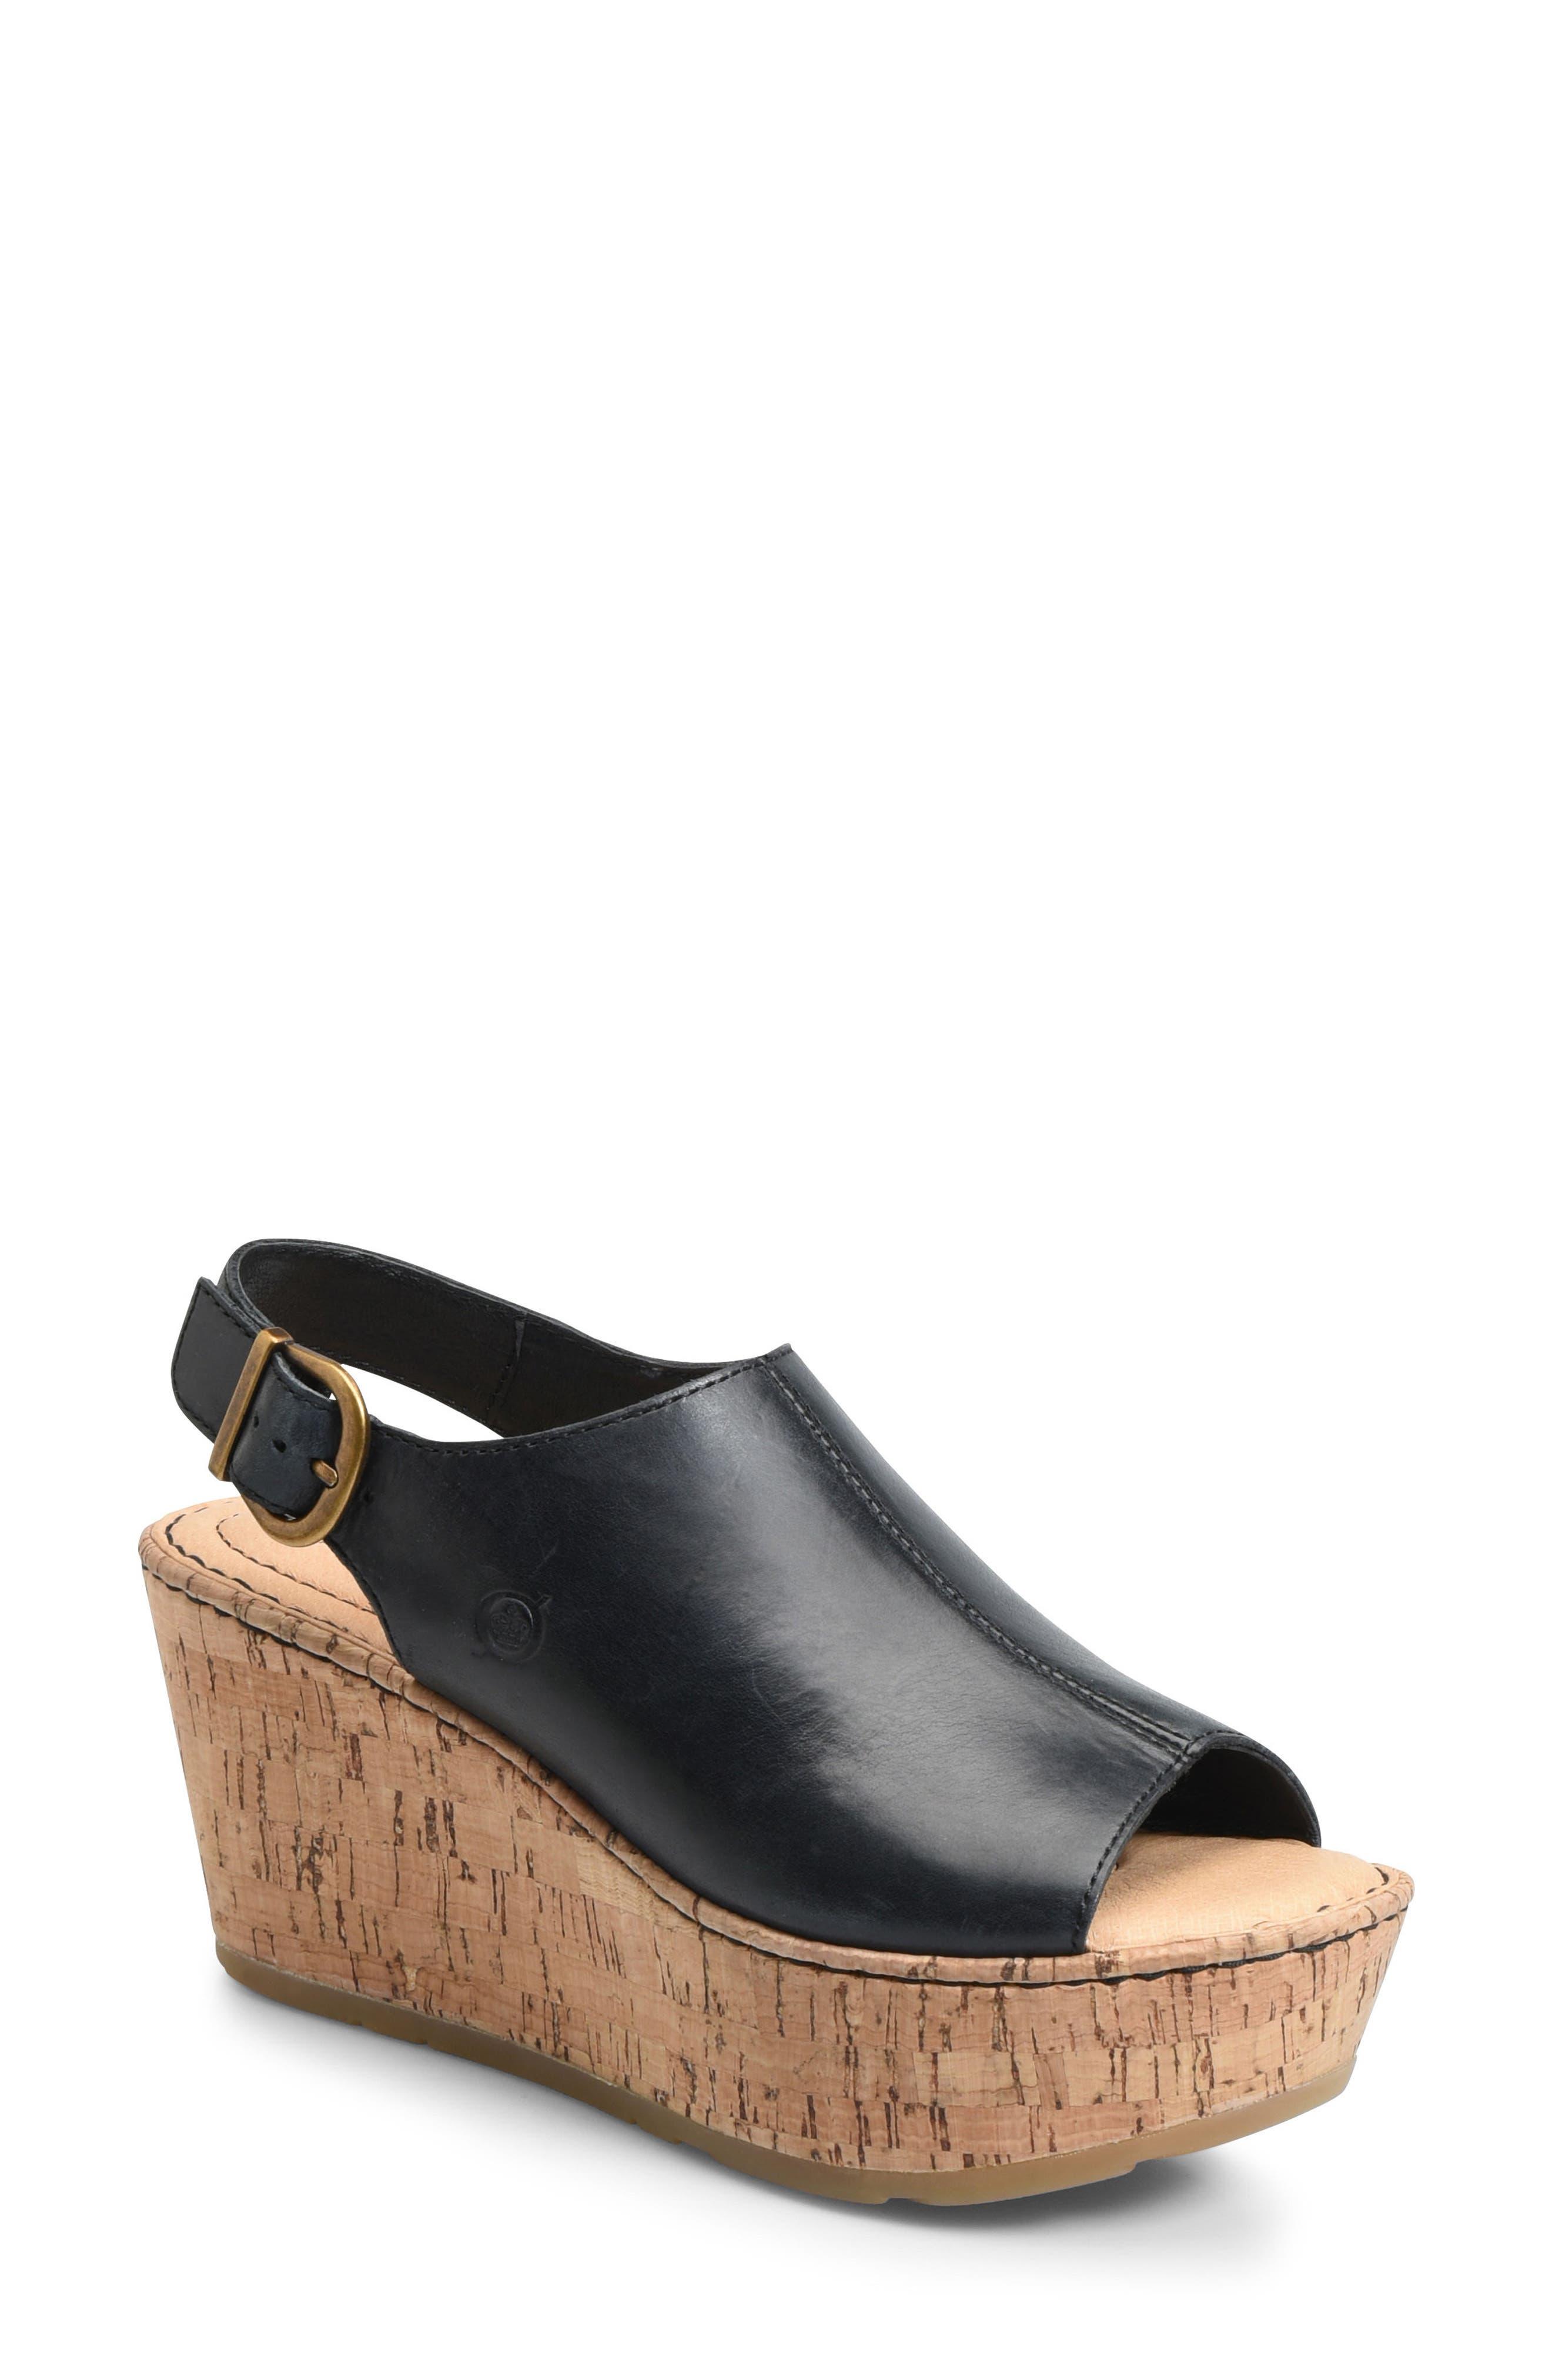 Børn Orbit Platform Wedge Sandal (Women)